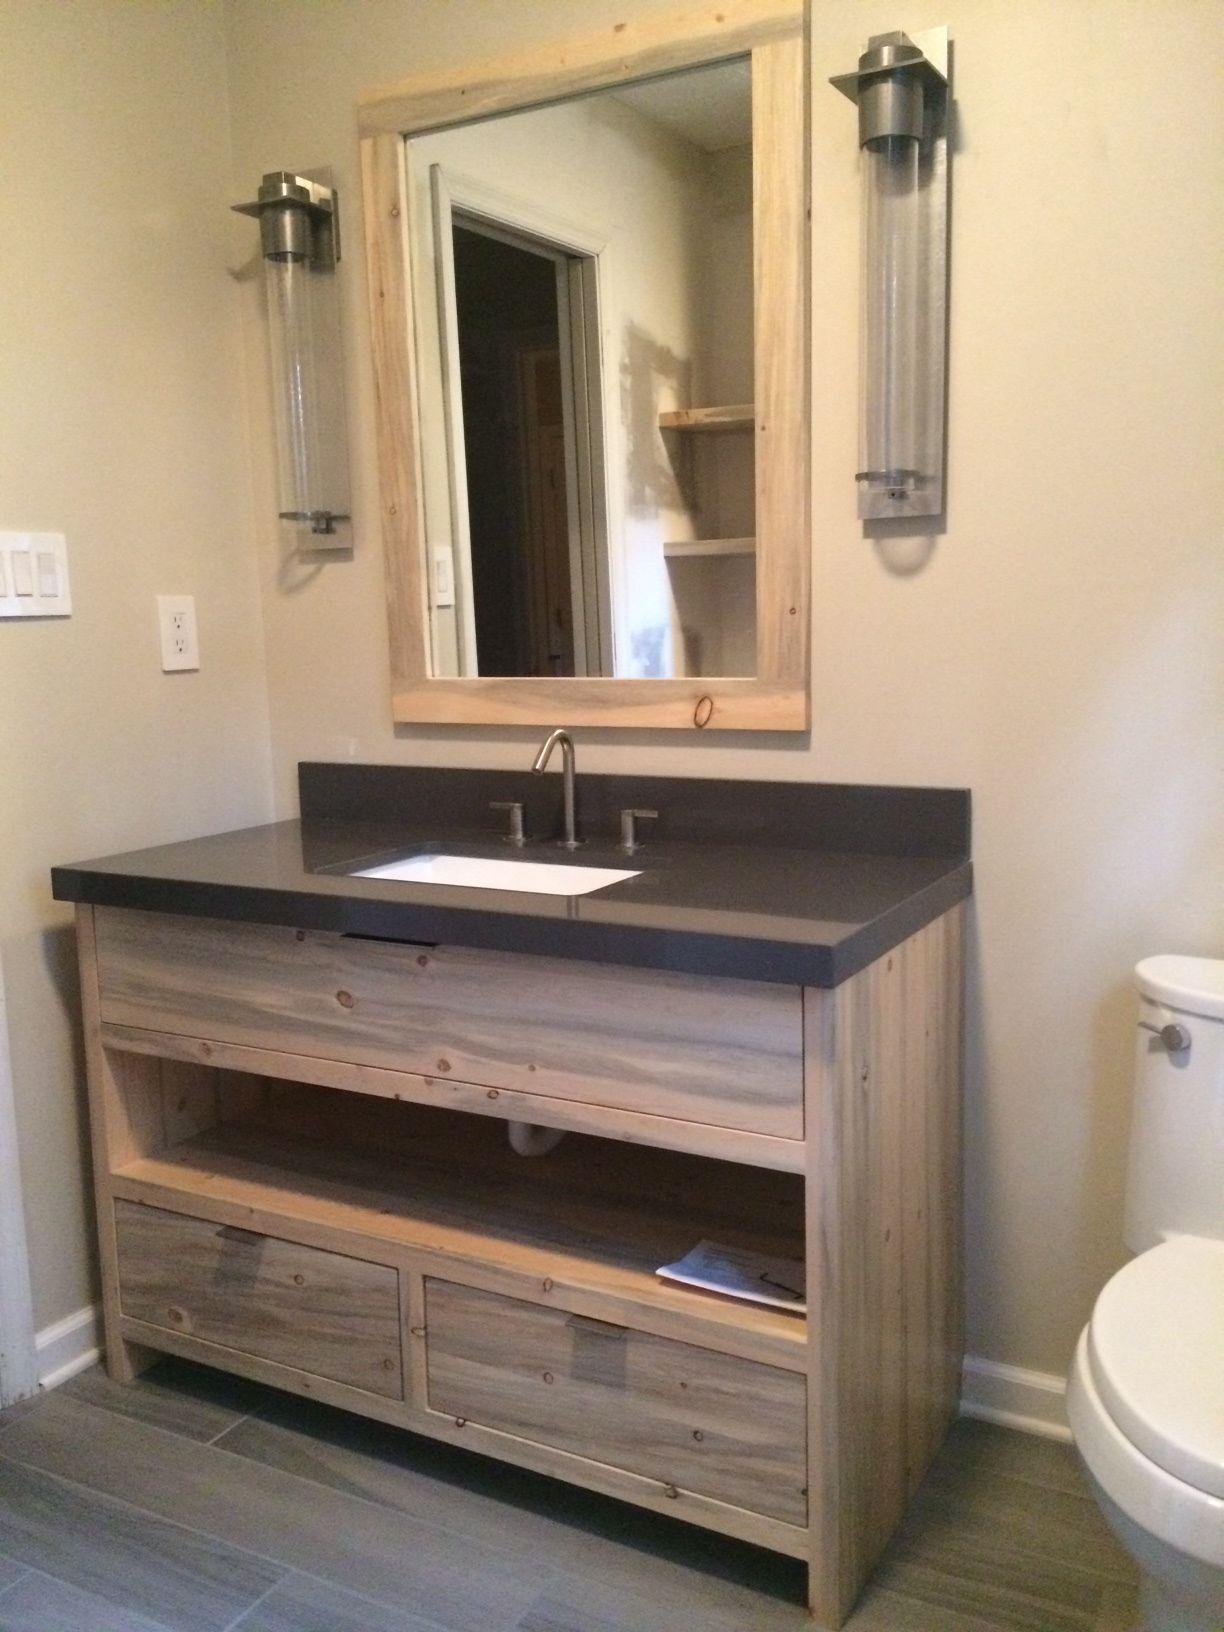 A custom beetle kill pine bathroom vanity built for a home in